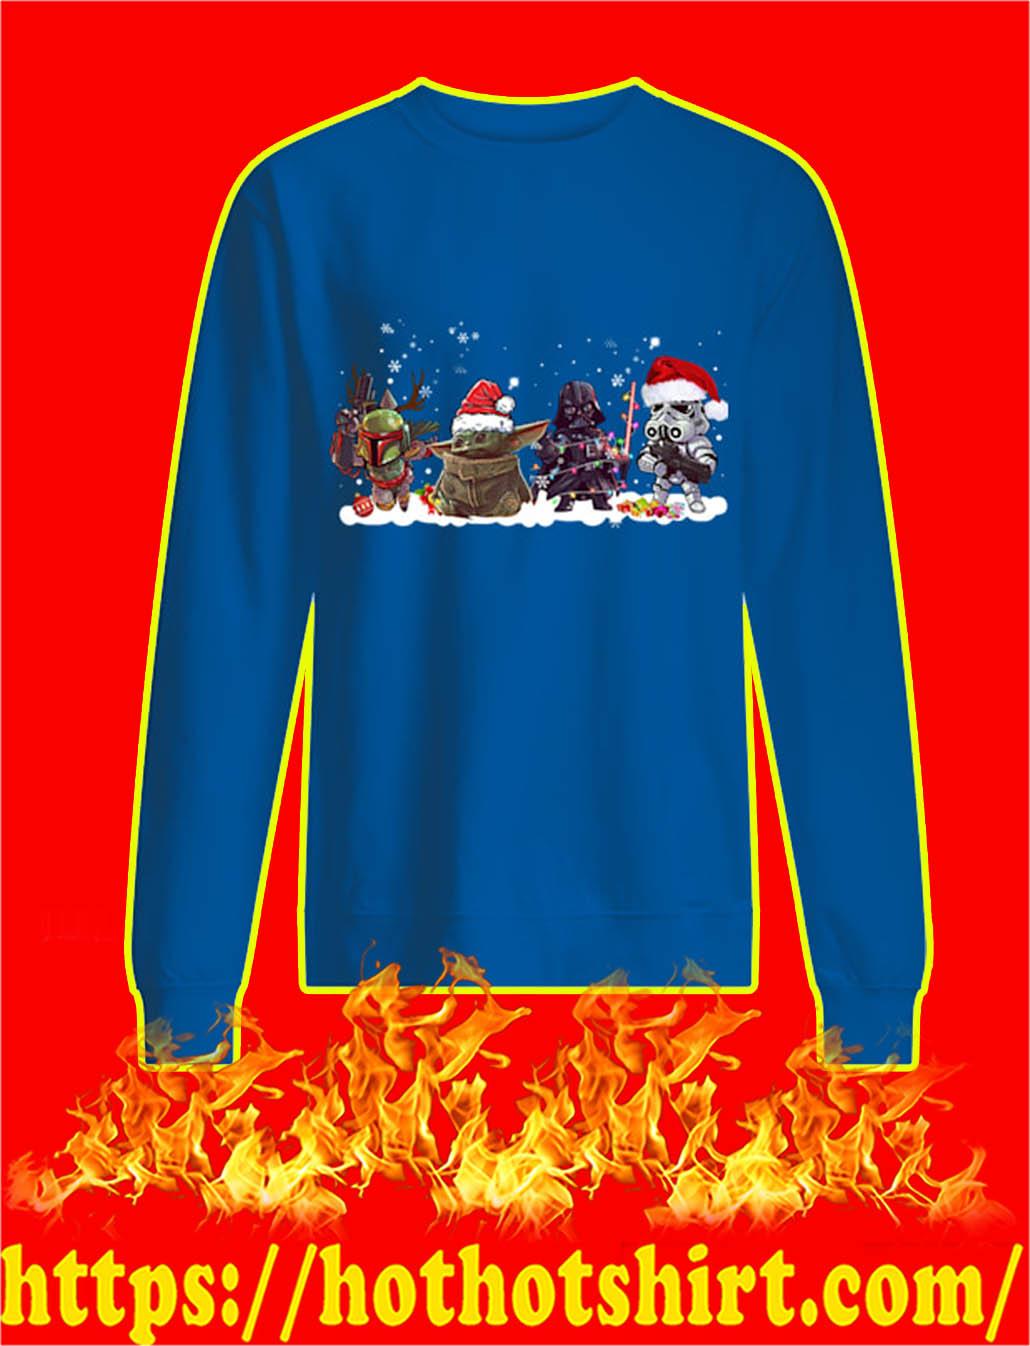 Boba Fett Baby Yoda Darth Vader and Stormtrooper Christmas sweatshirt